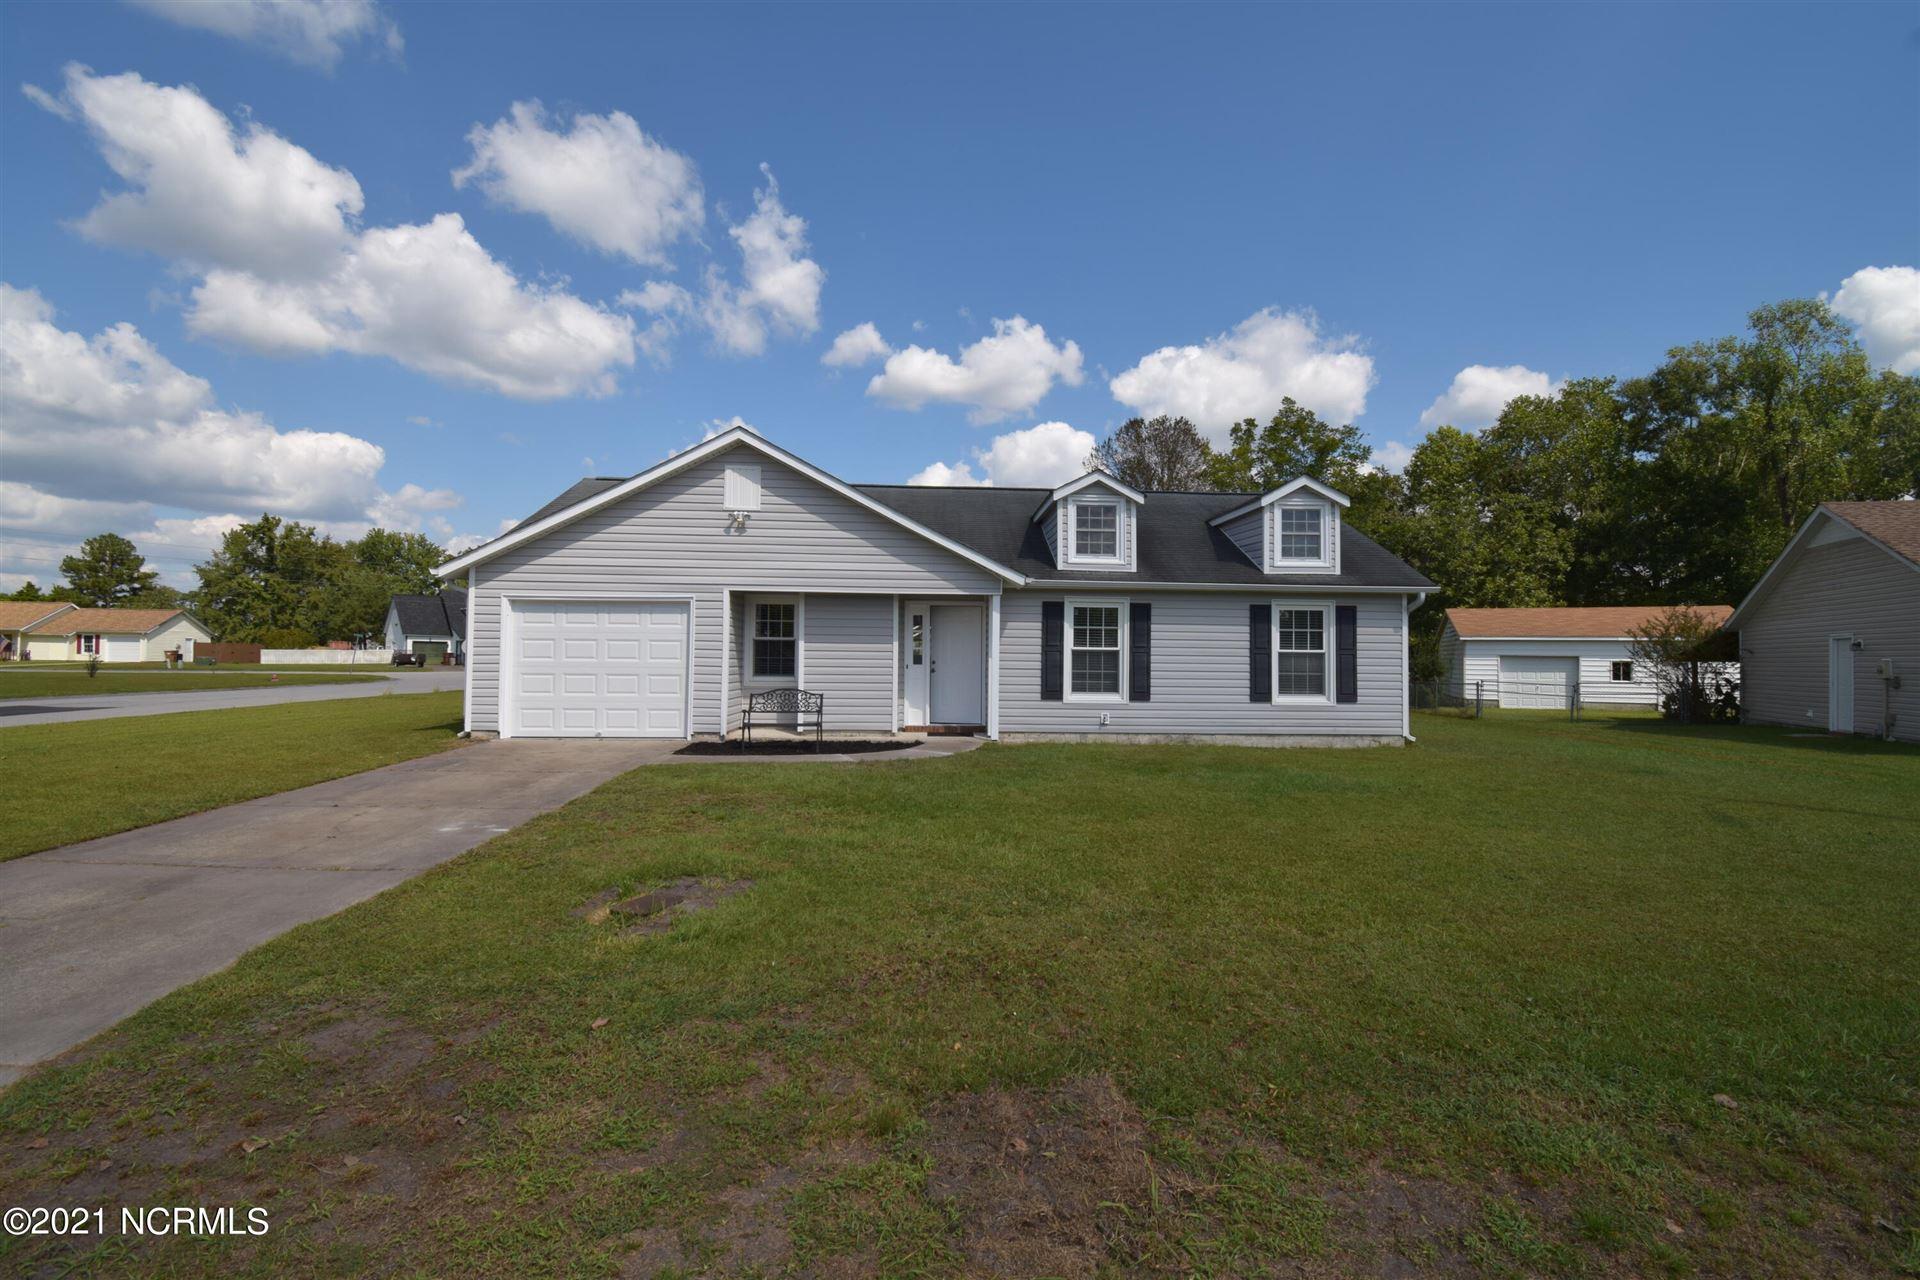 Photo of 101 Meadow Lane, Jacksonville, NC 28546 (MLS # 100293250)